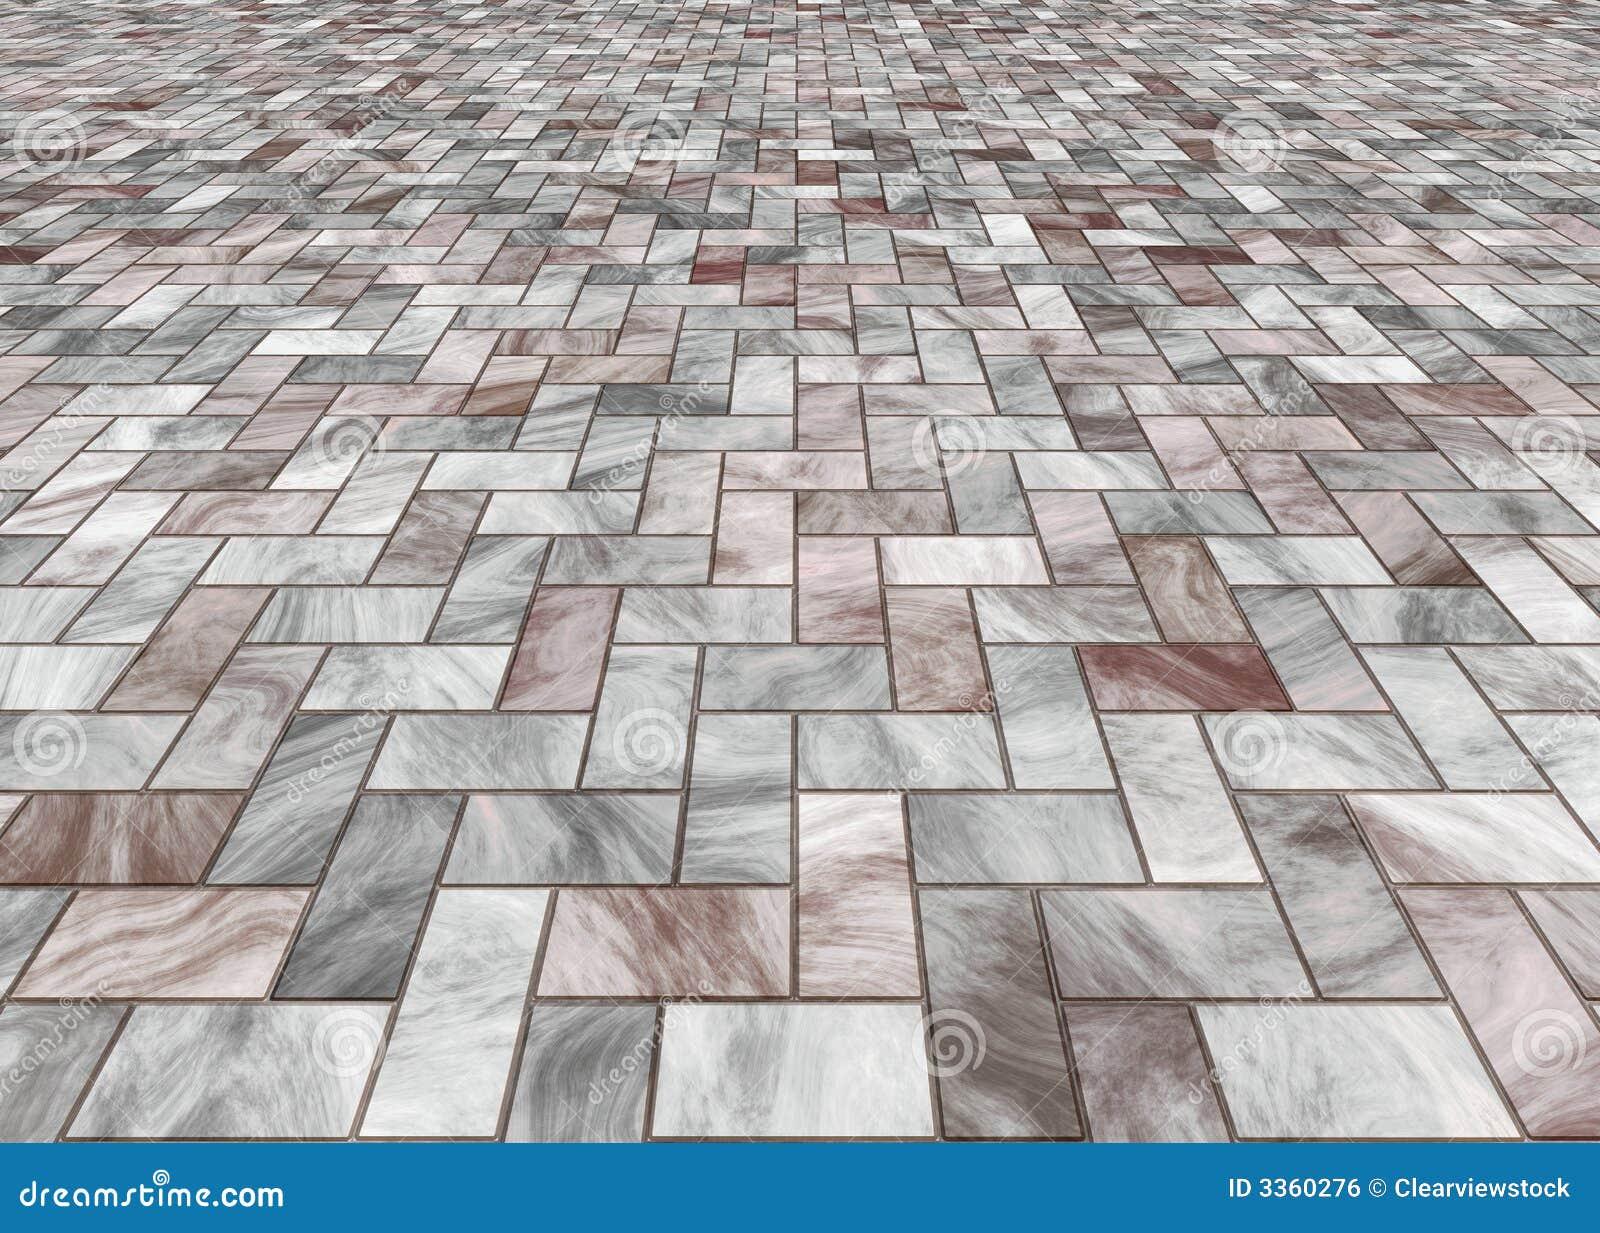 Paved Marble Floor Tiles Stock Illustration Illustration